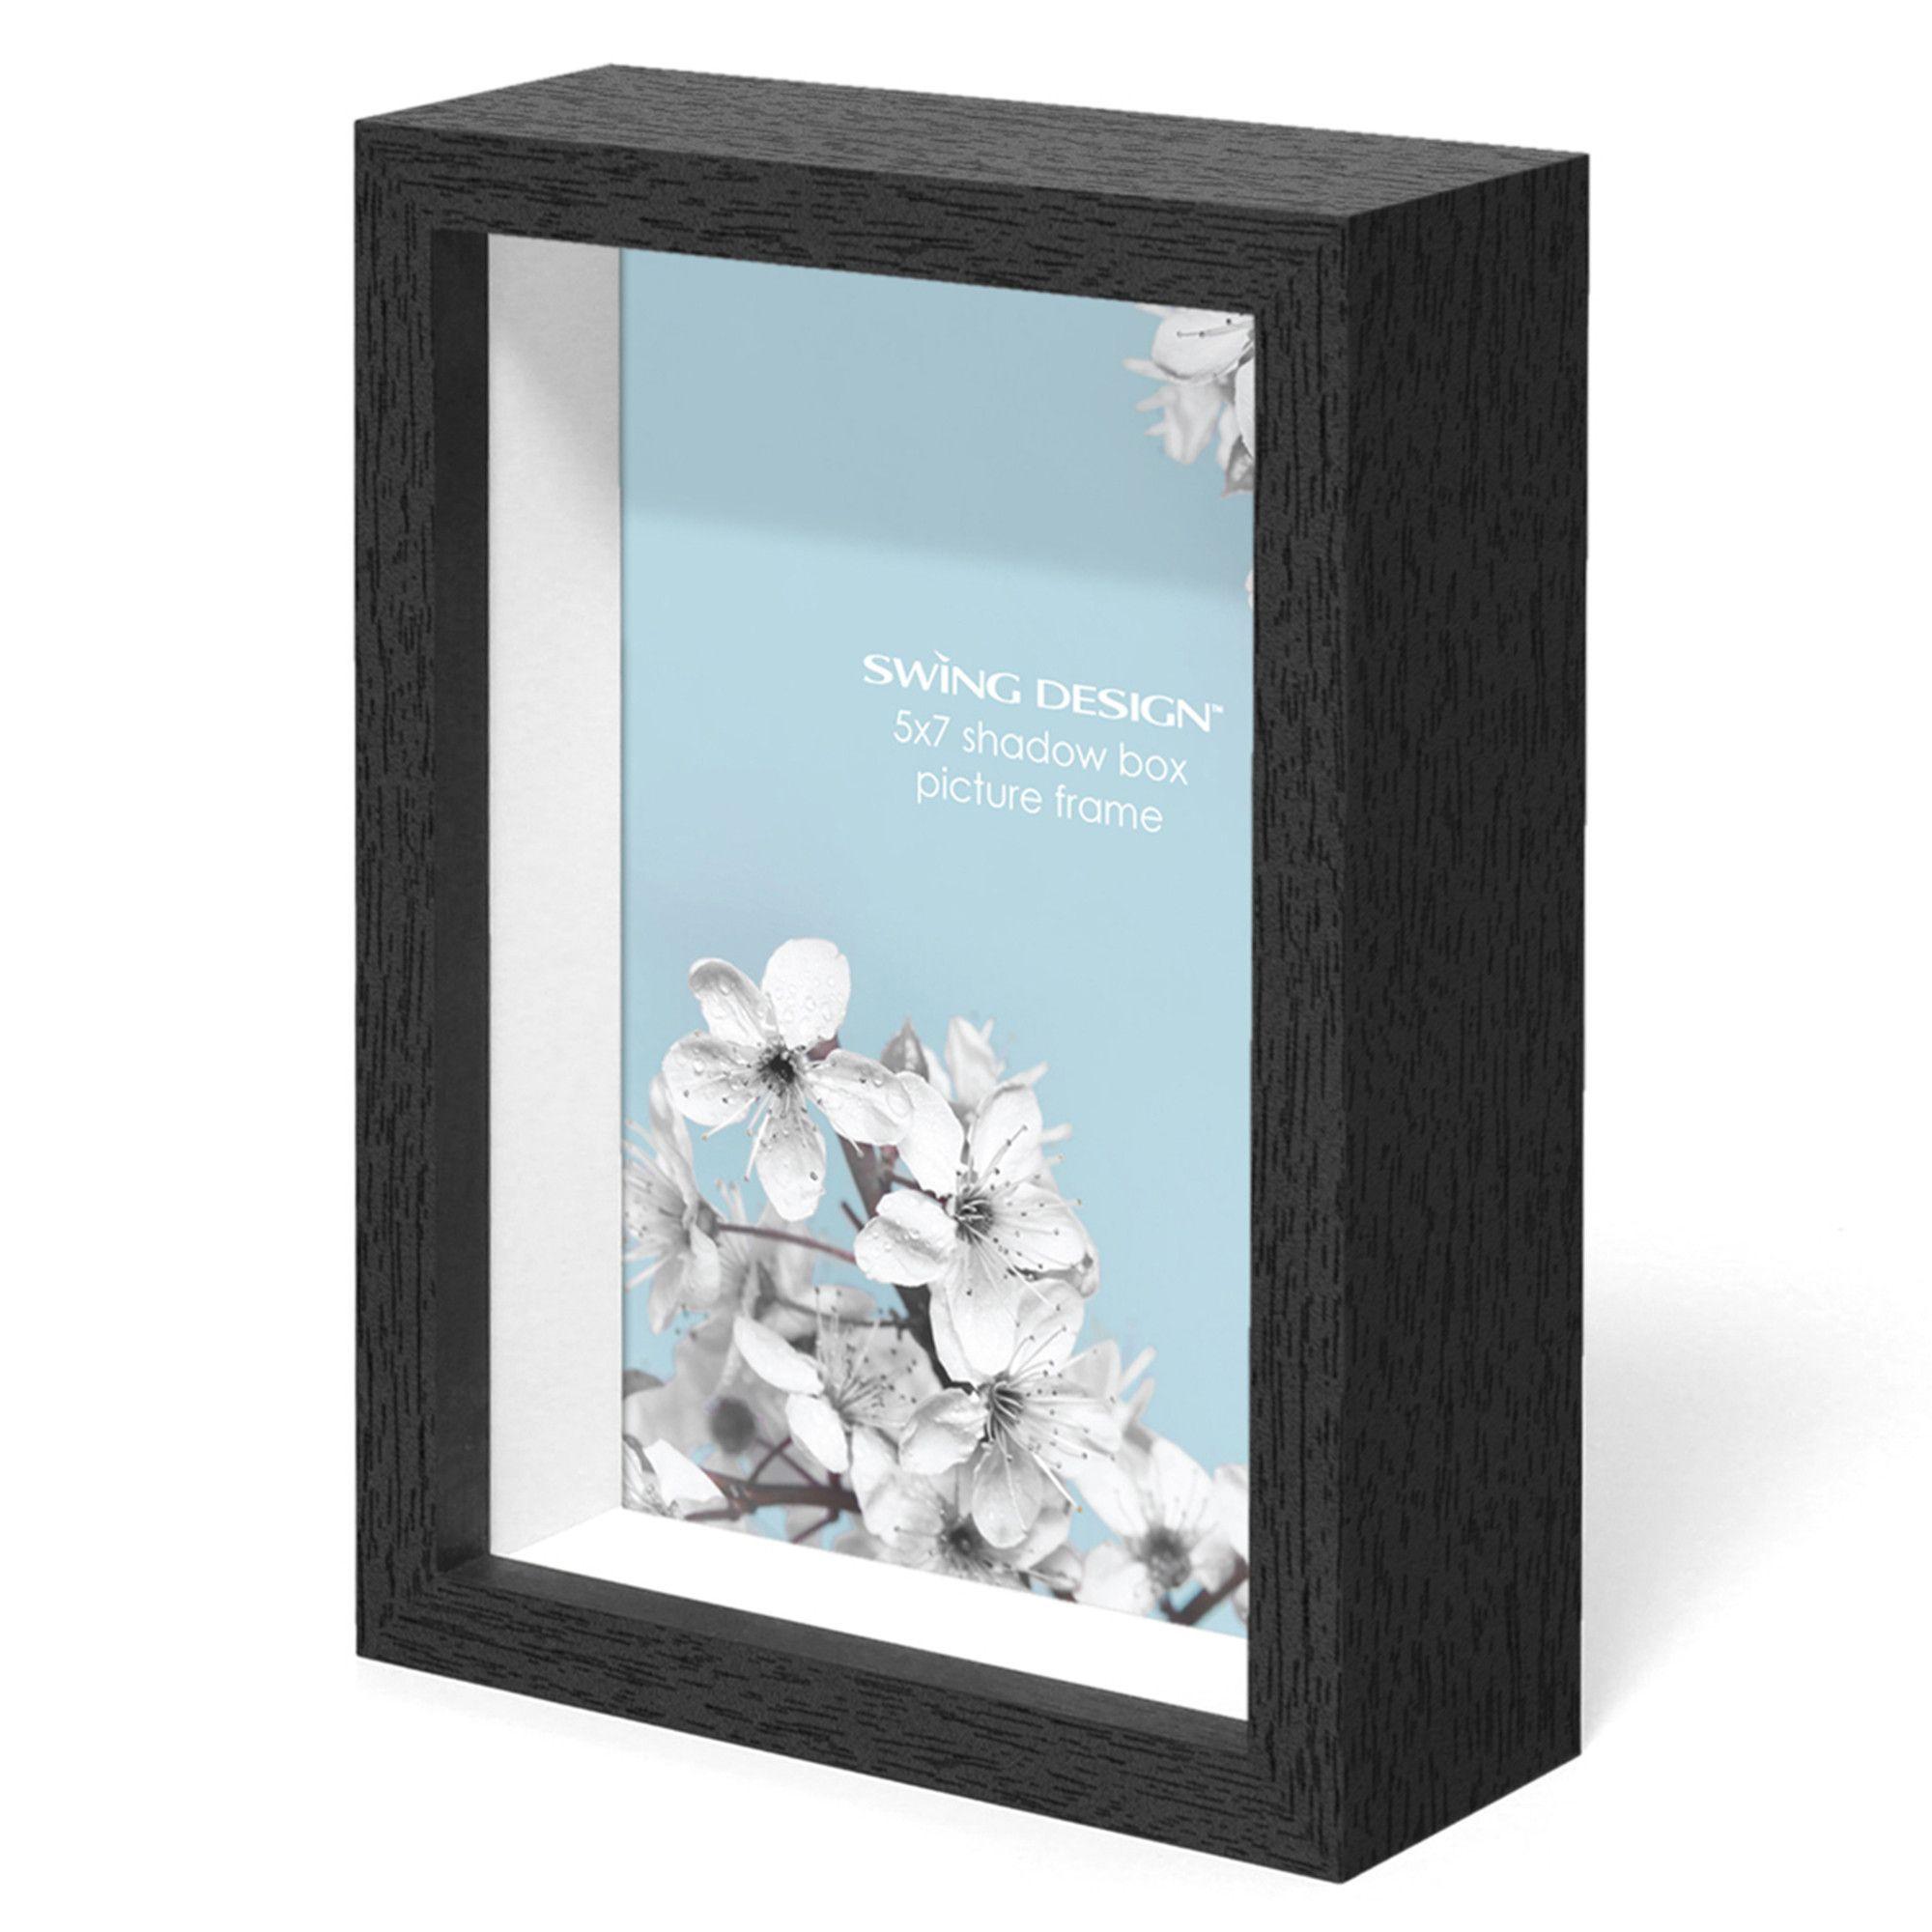 Chroma shadow box frame black 5x7 shadow box frames and products chroma shadow box frame black 5x7 jeuxipadfo Image collections